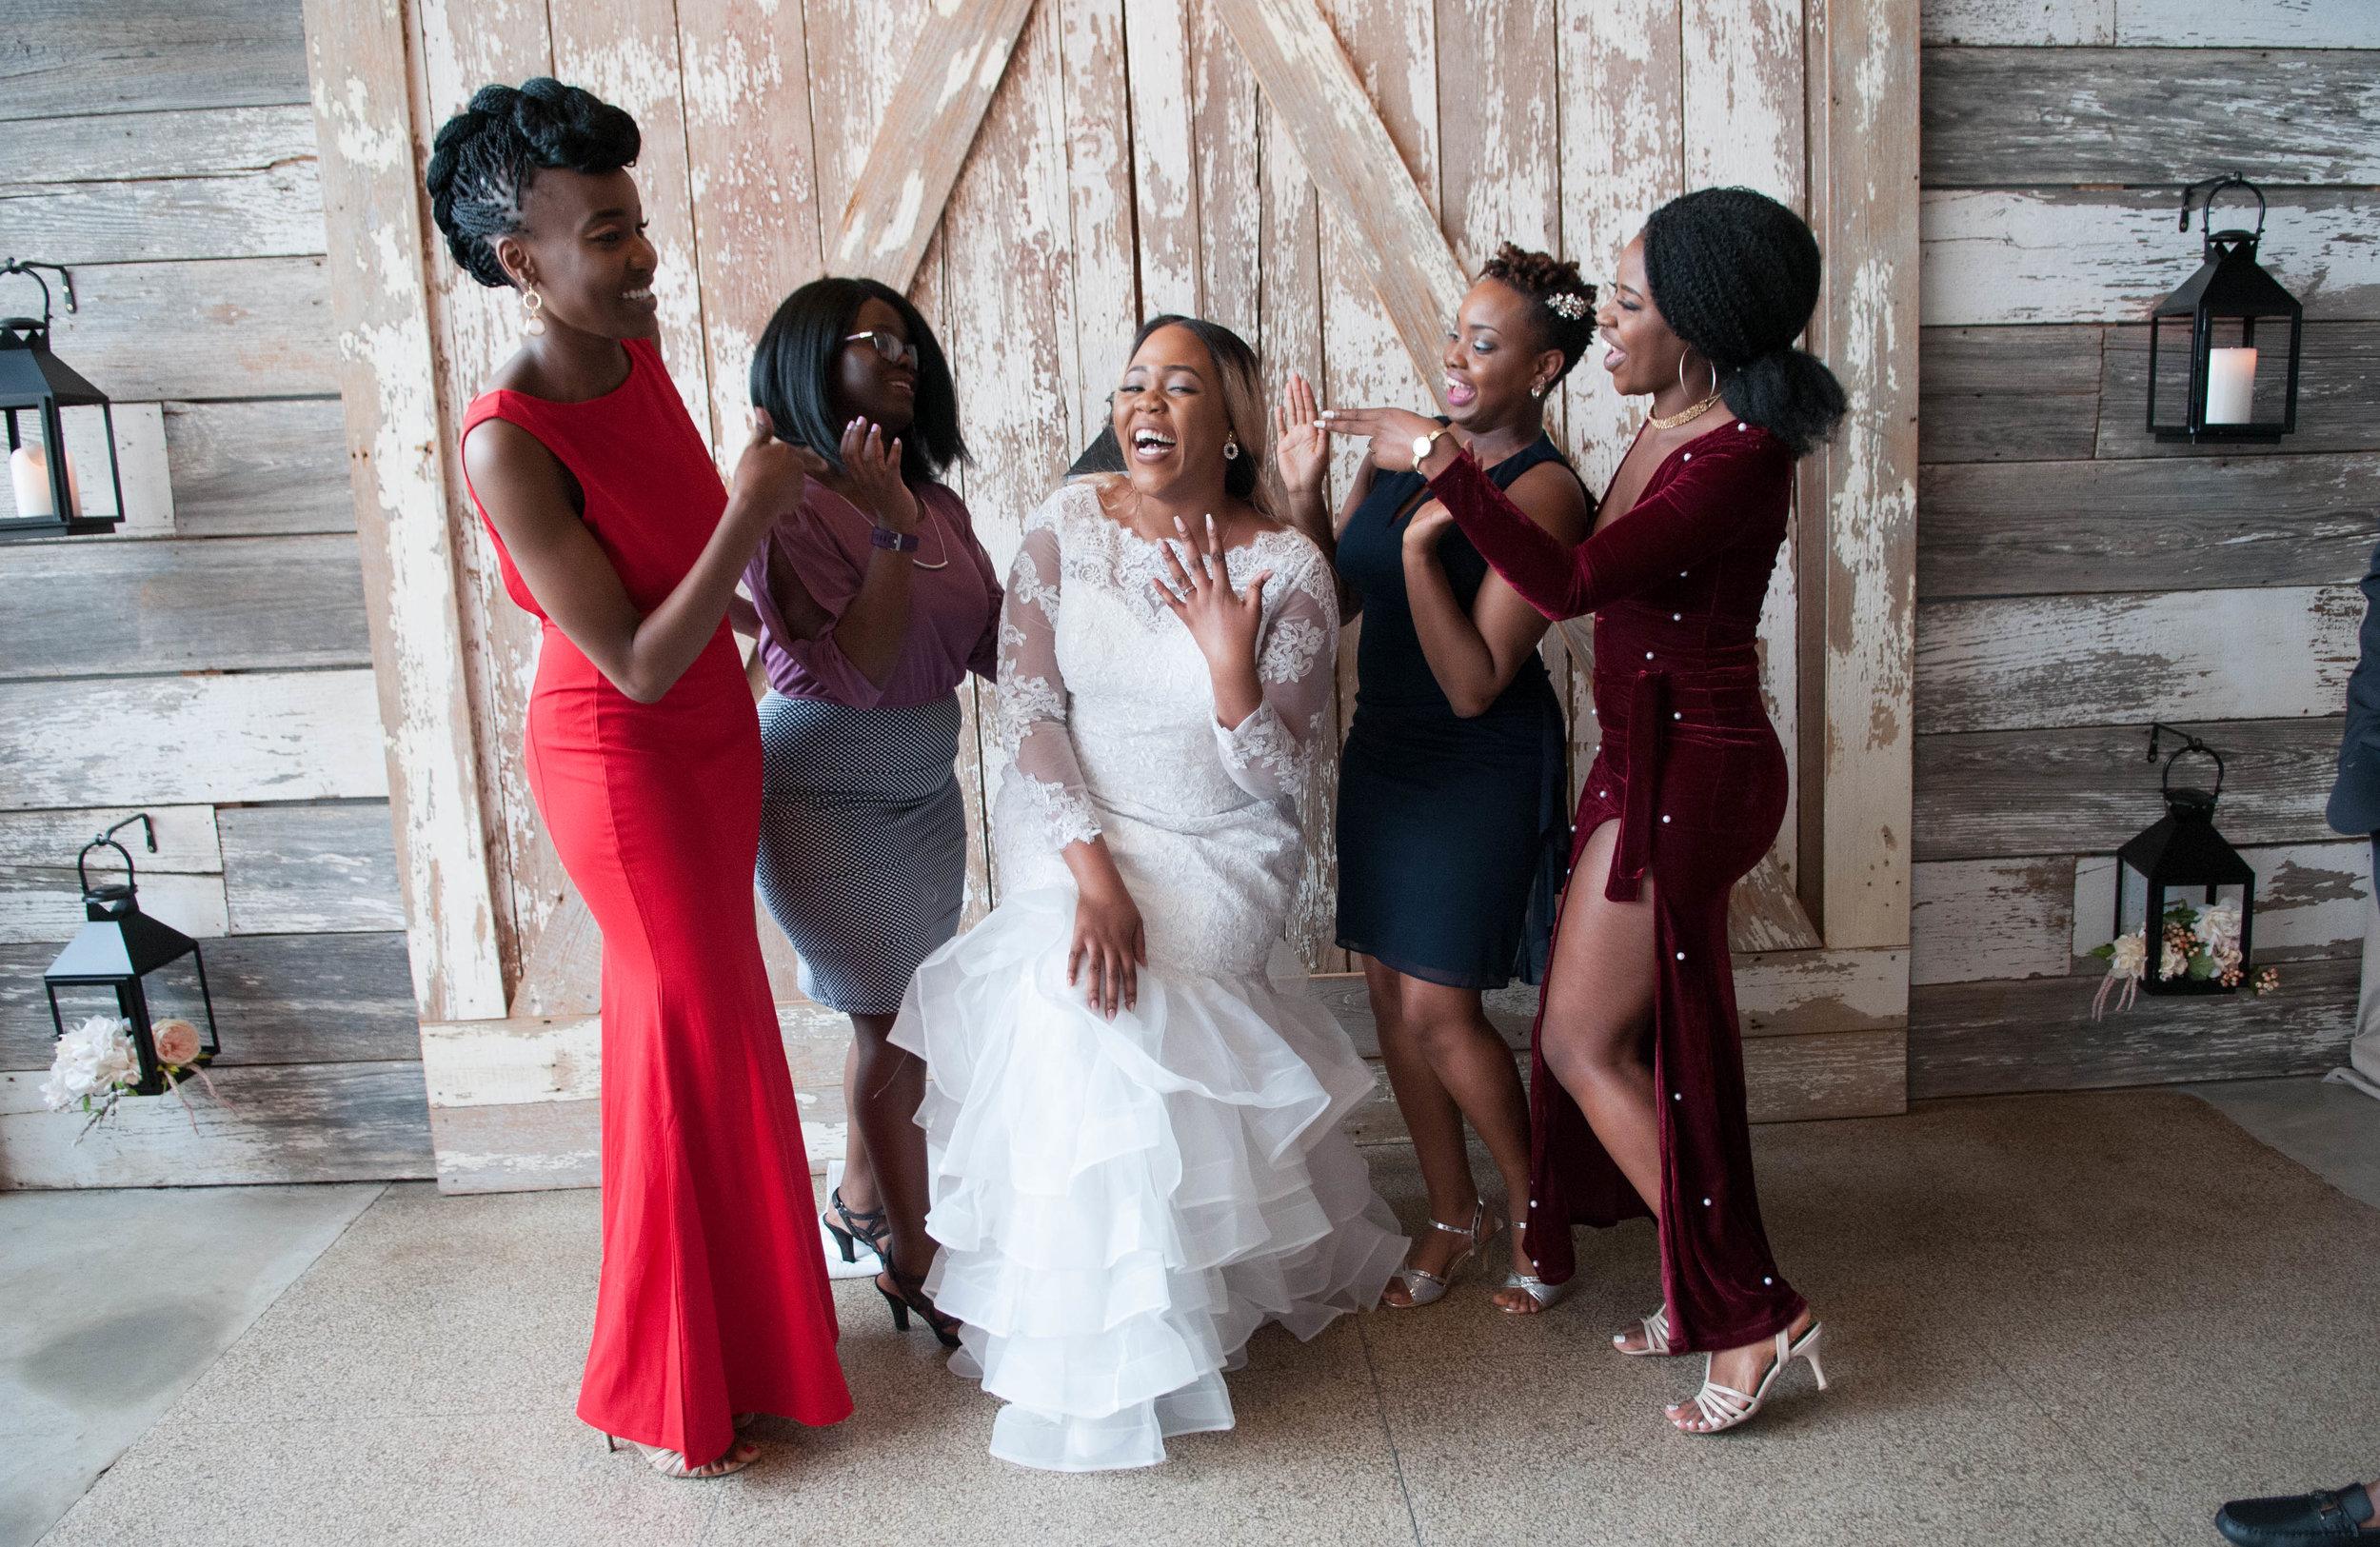 Kansas+City_Small+Wedding_Elope_Intimate_Ceremony_Best+Friends_30.jpg